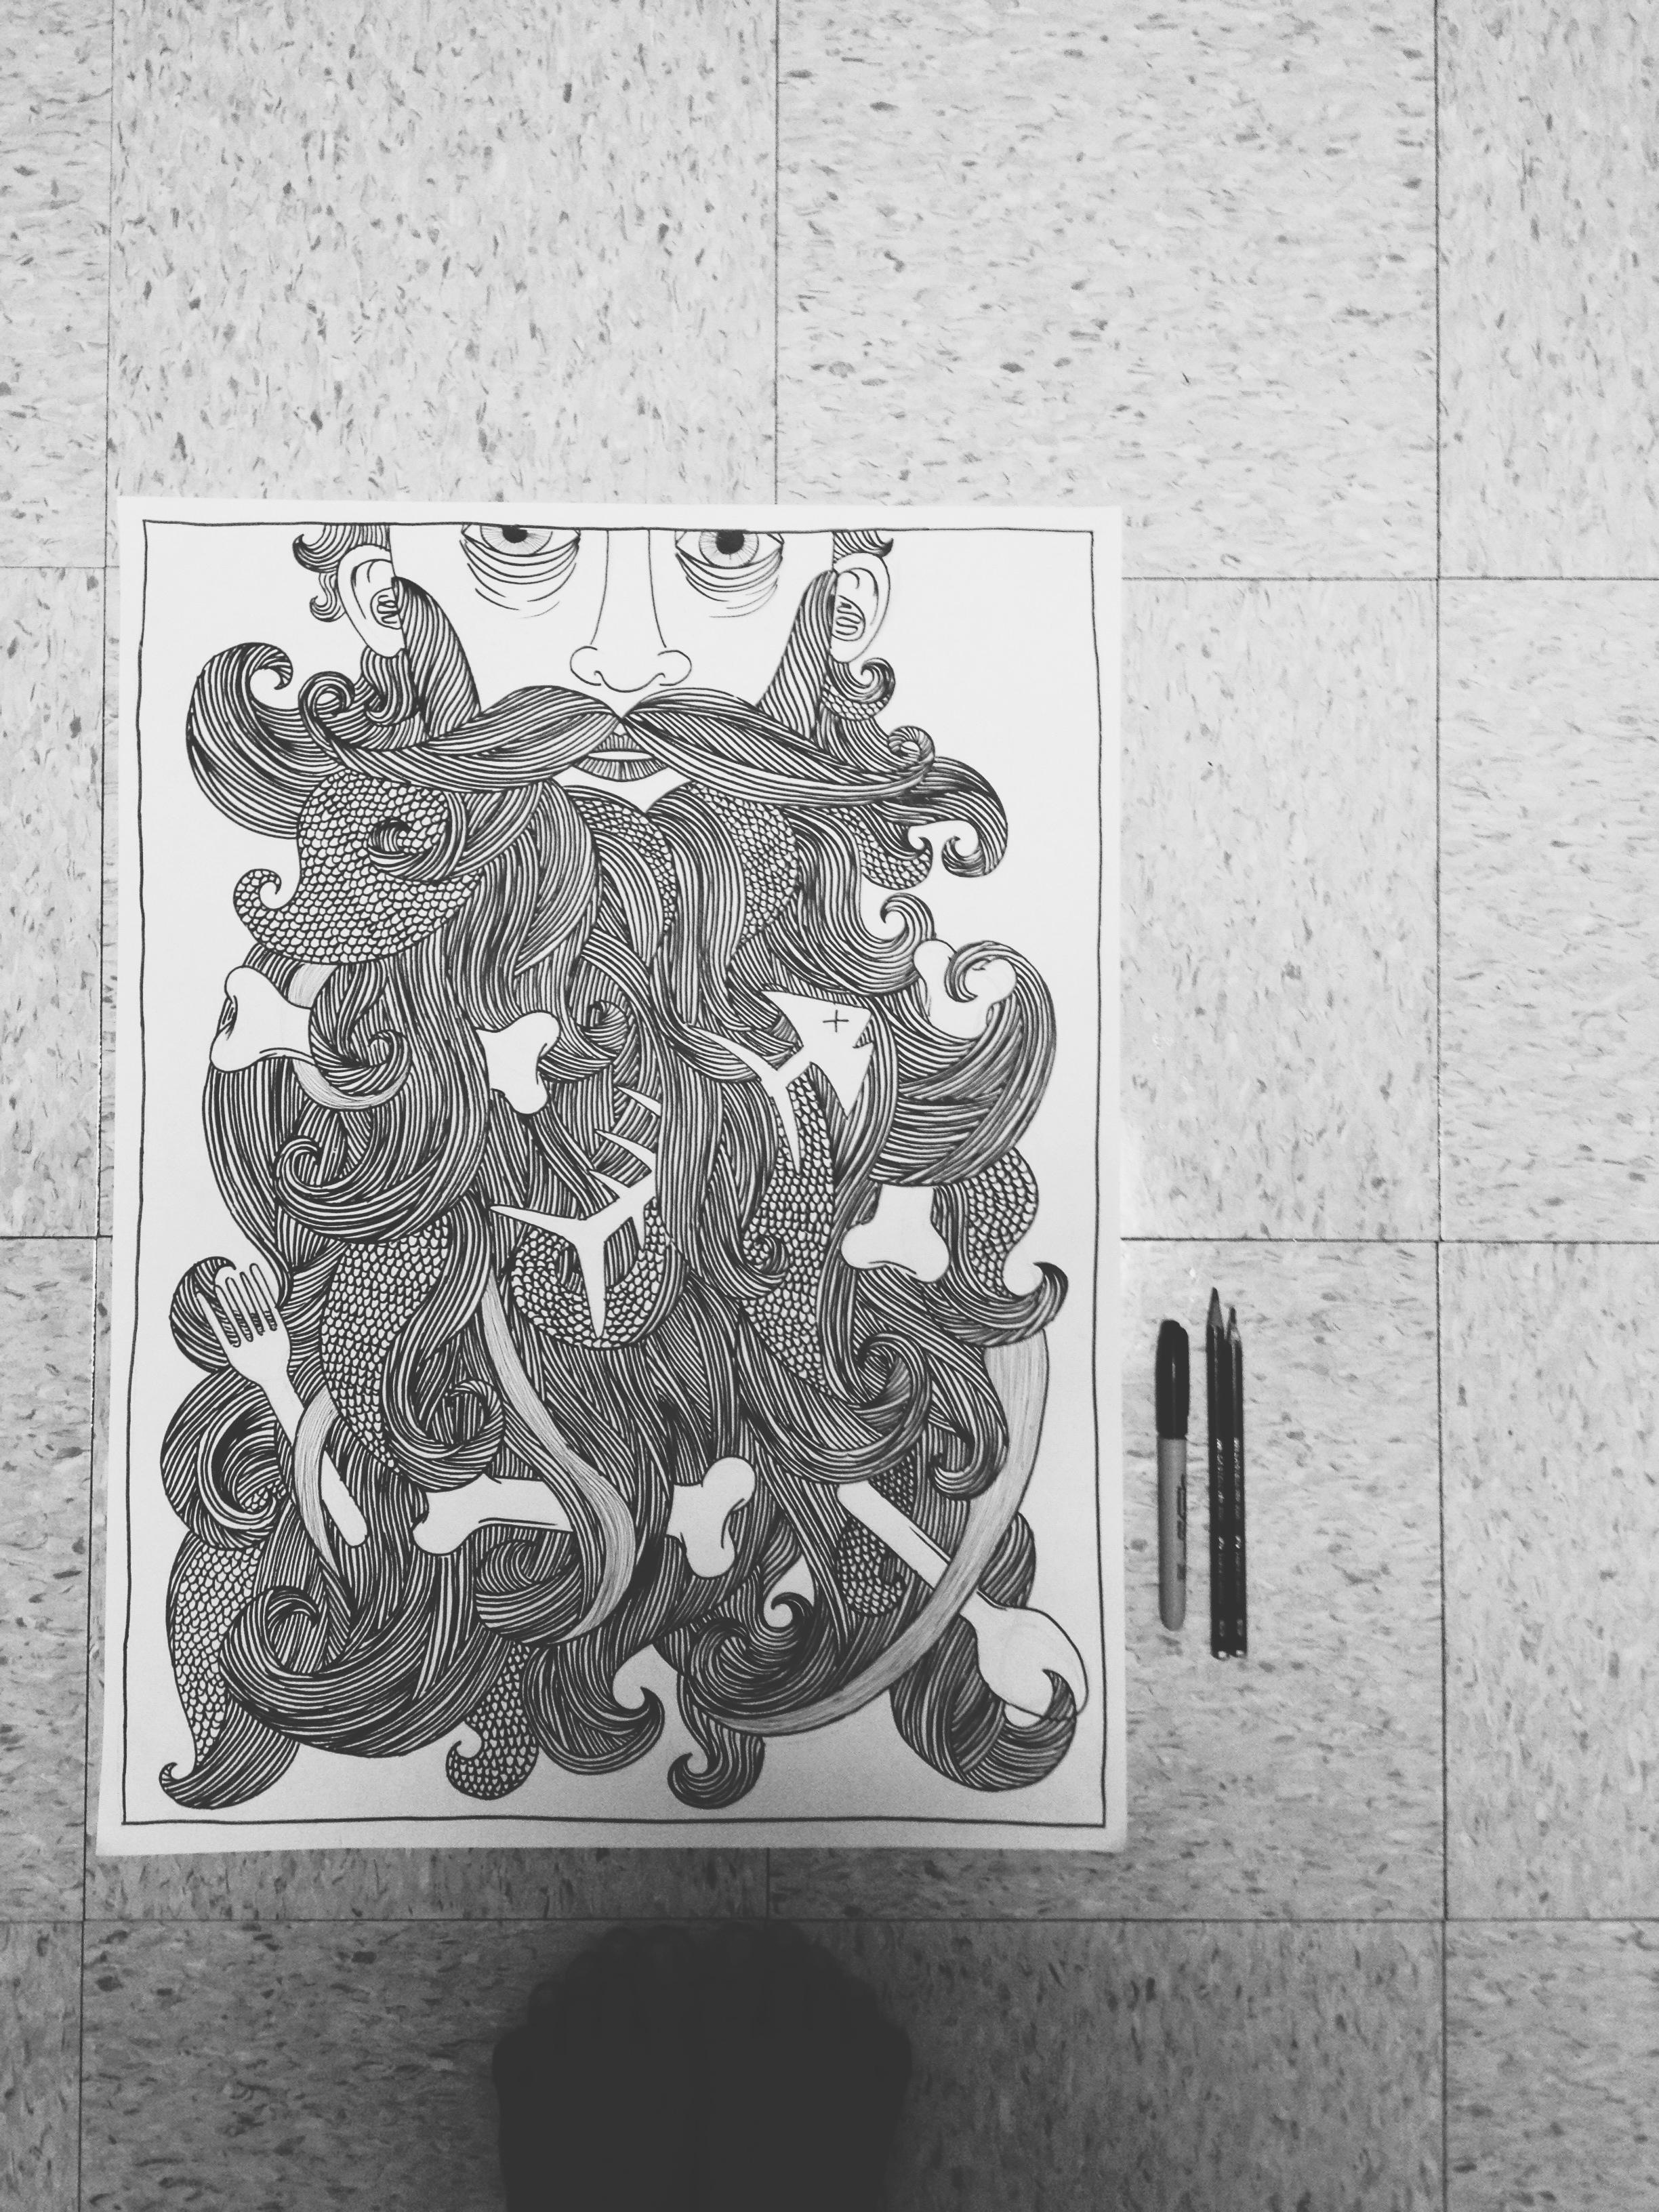 Weekend doodling...